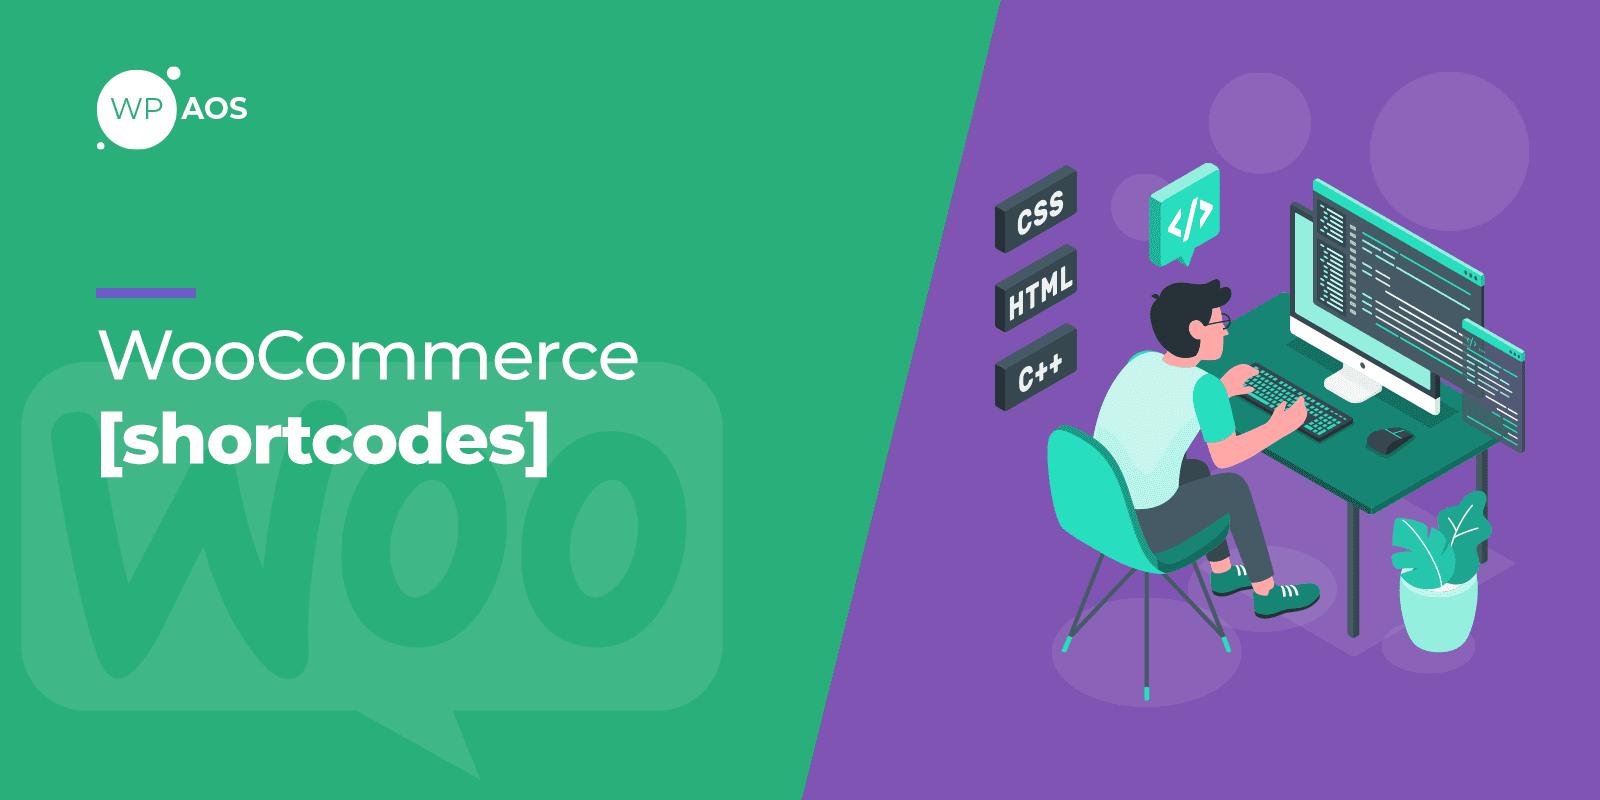 WooCommerce Shortcodes, WordPress Maintenance, wpaos